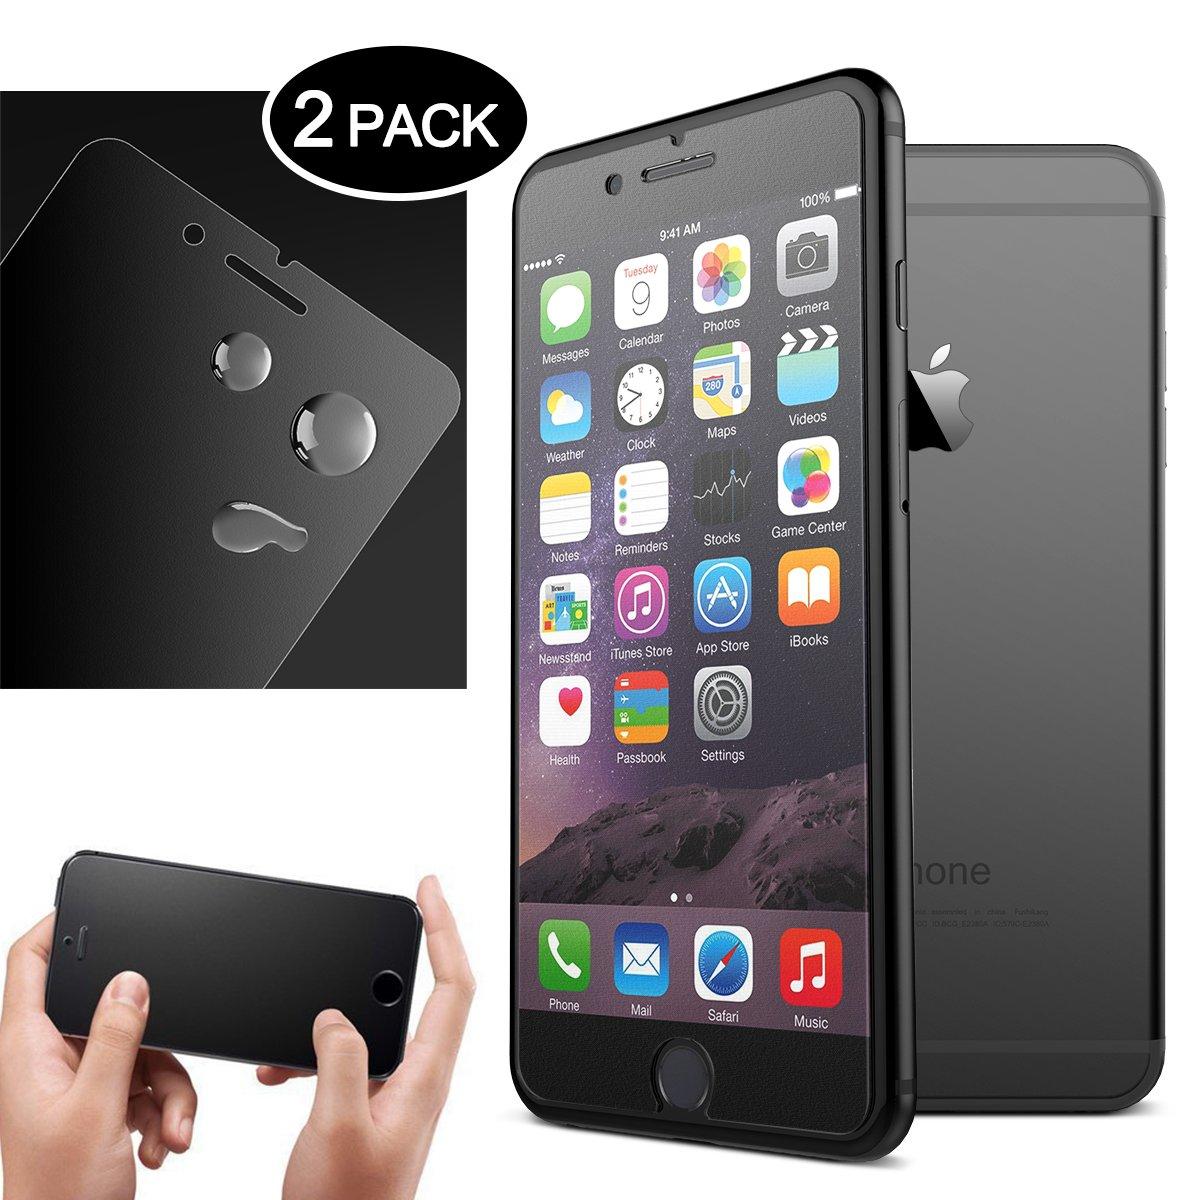 iPhone 6 Plus/iPhone 6S Plusガラススクリーンプロテクター(2パック)、Dexnor iPhone 6 Plus 6S Plus強化飛散防止ガラススクリーンプロテクター0.33 mm 2.5D 9H 6 Plus 6S Plus用透明飛散防止フィルム   B074JYLPF3